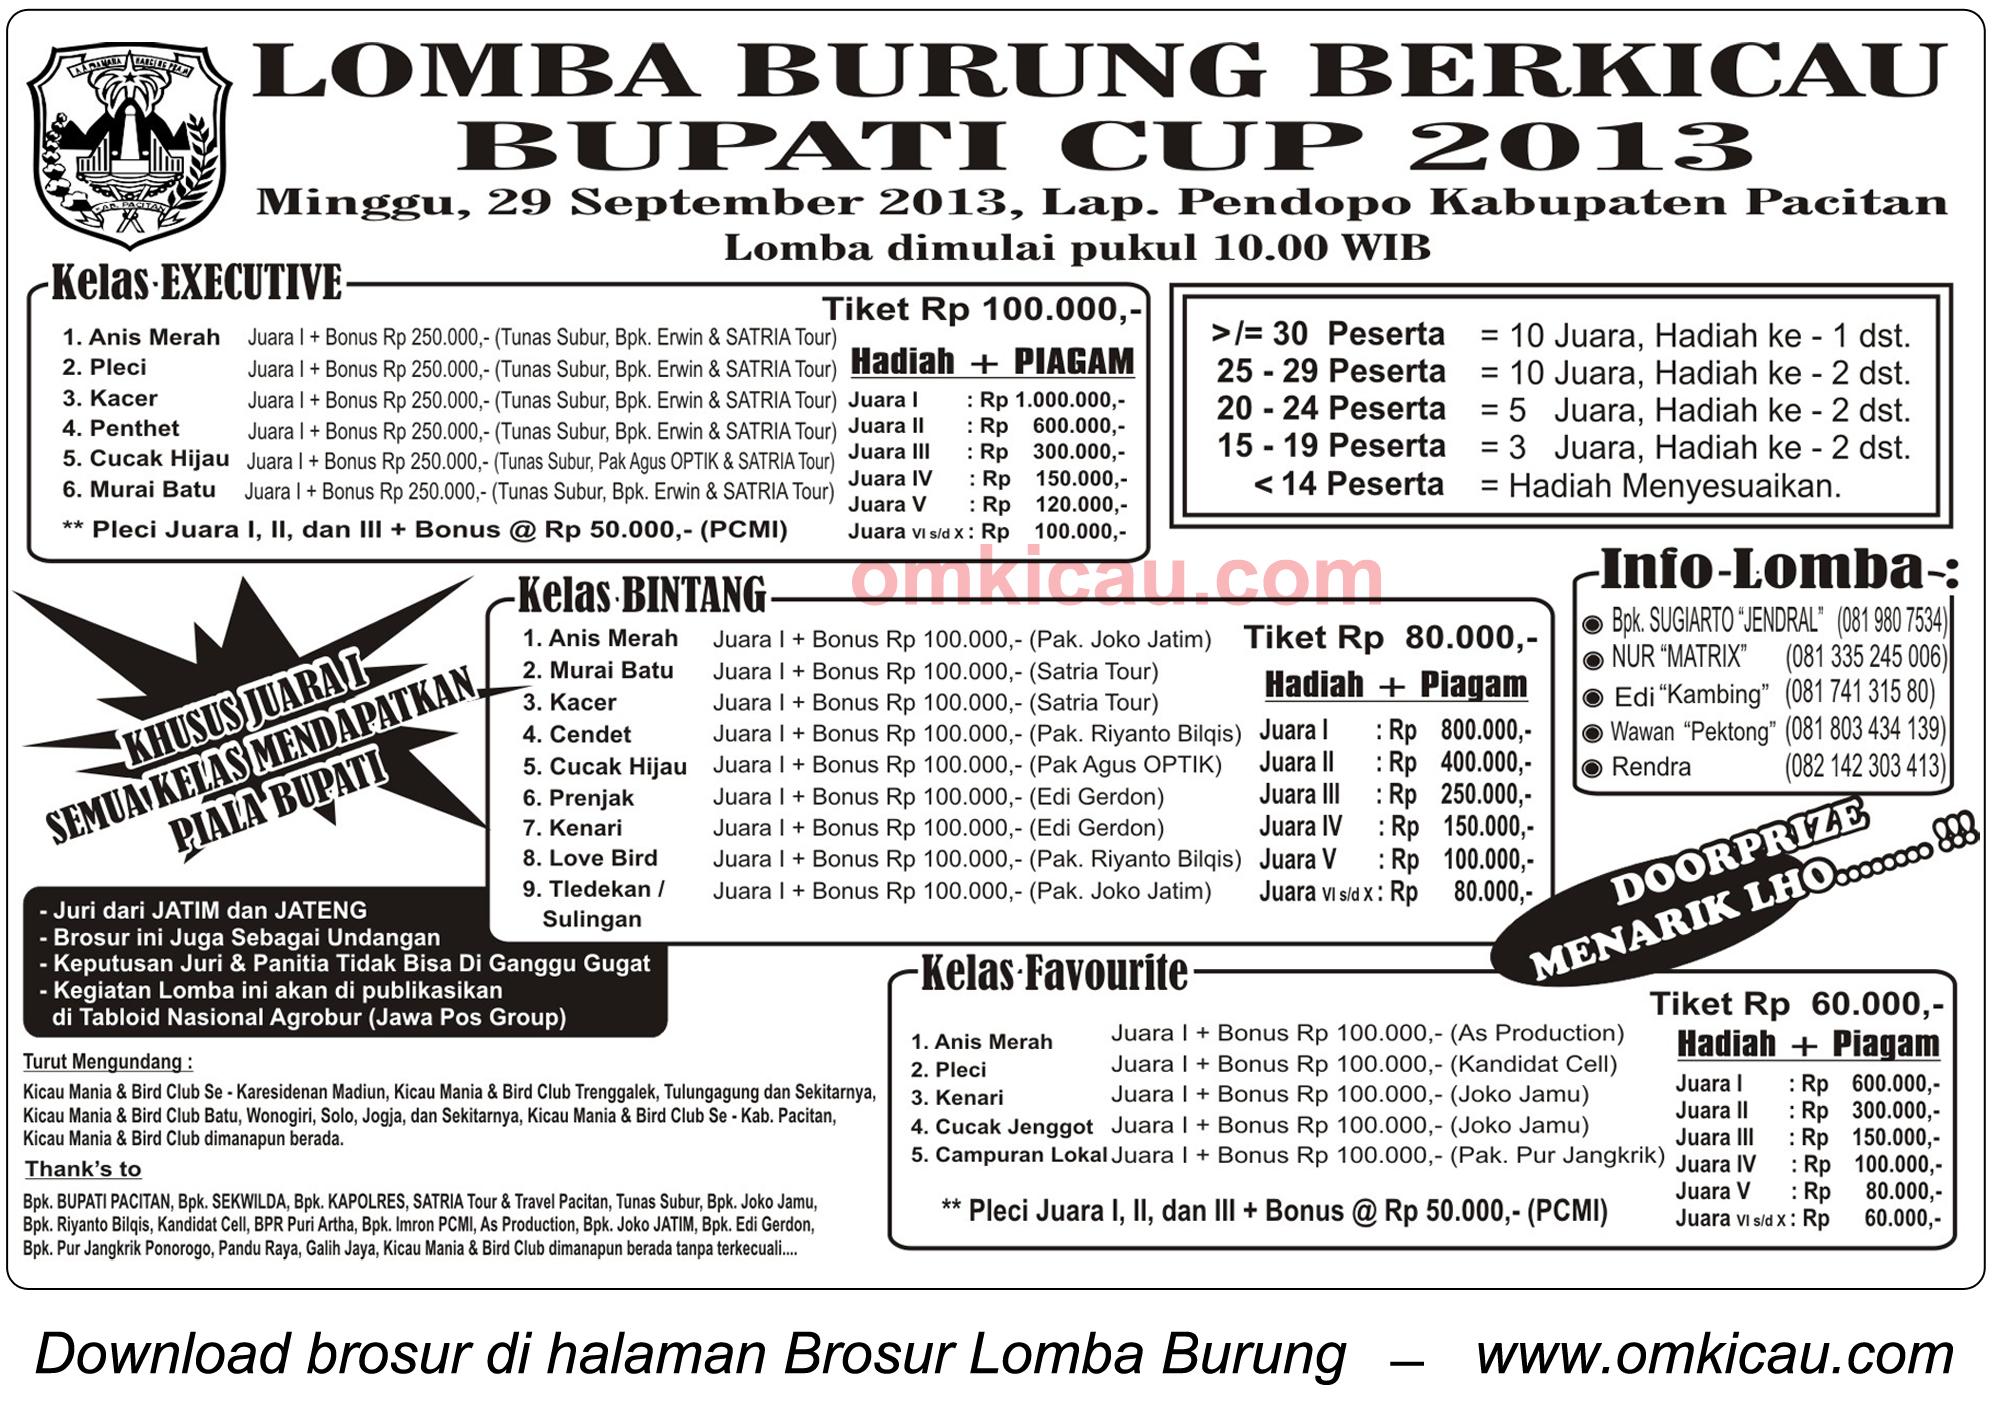 Brosur Lomba Burung Bupati Cup, Pacitan, 29 September 2013